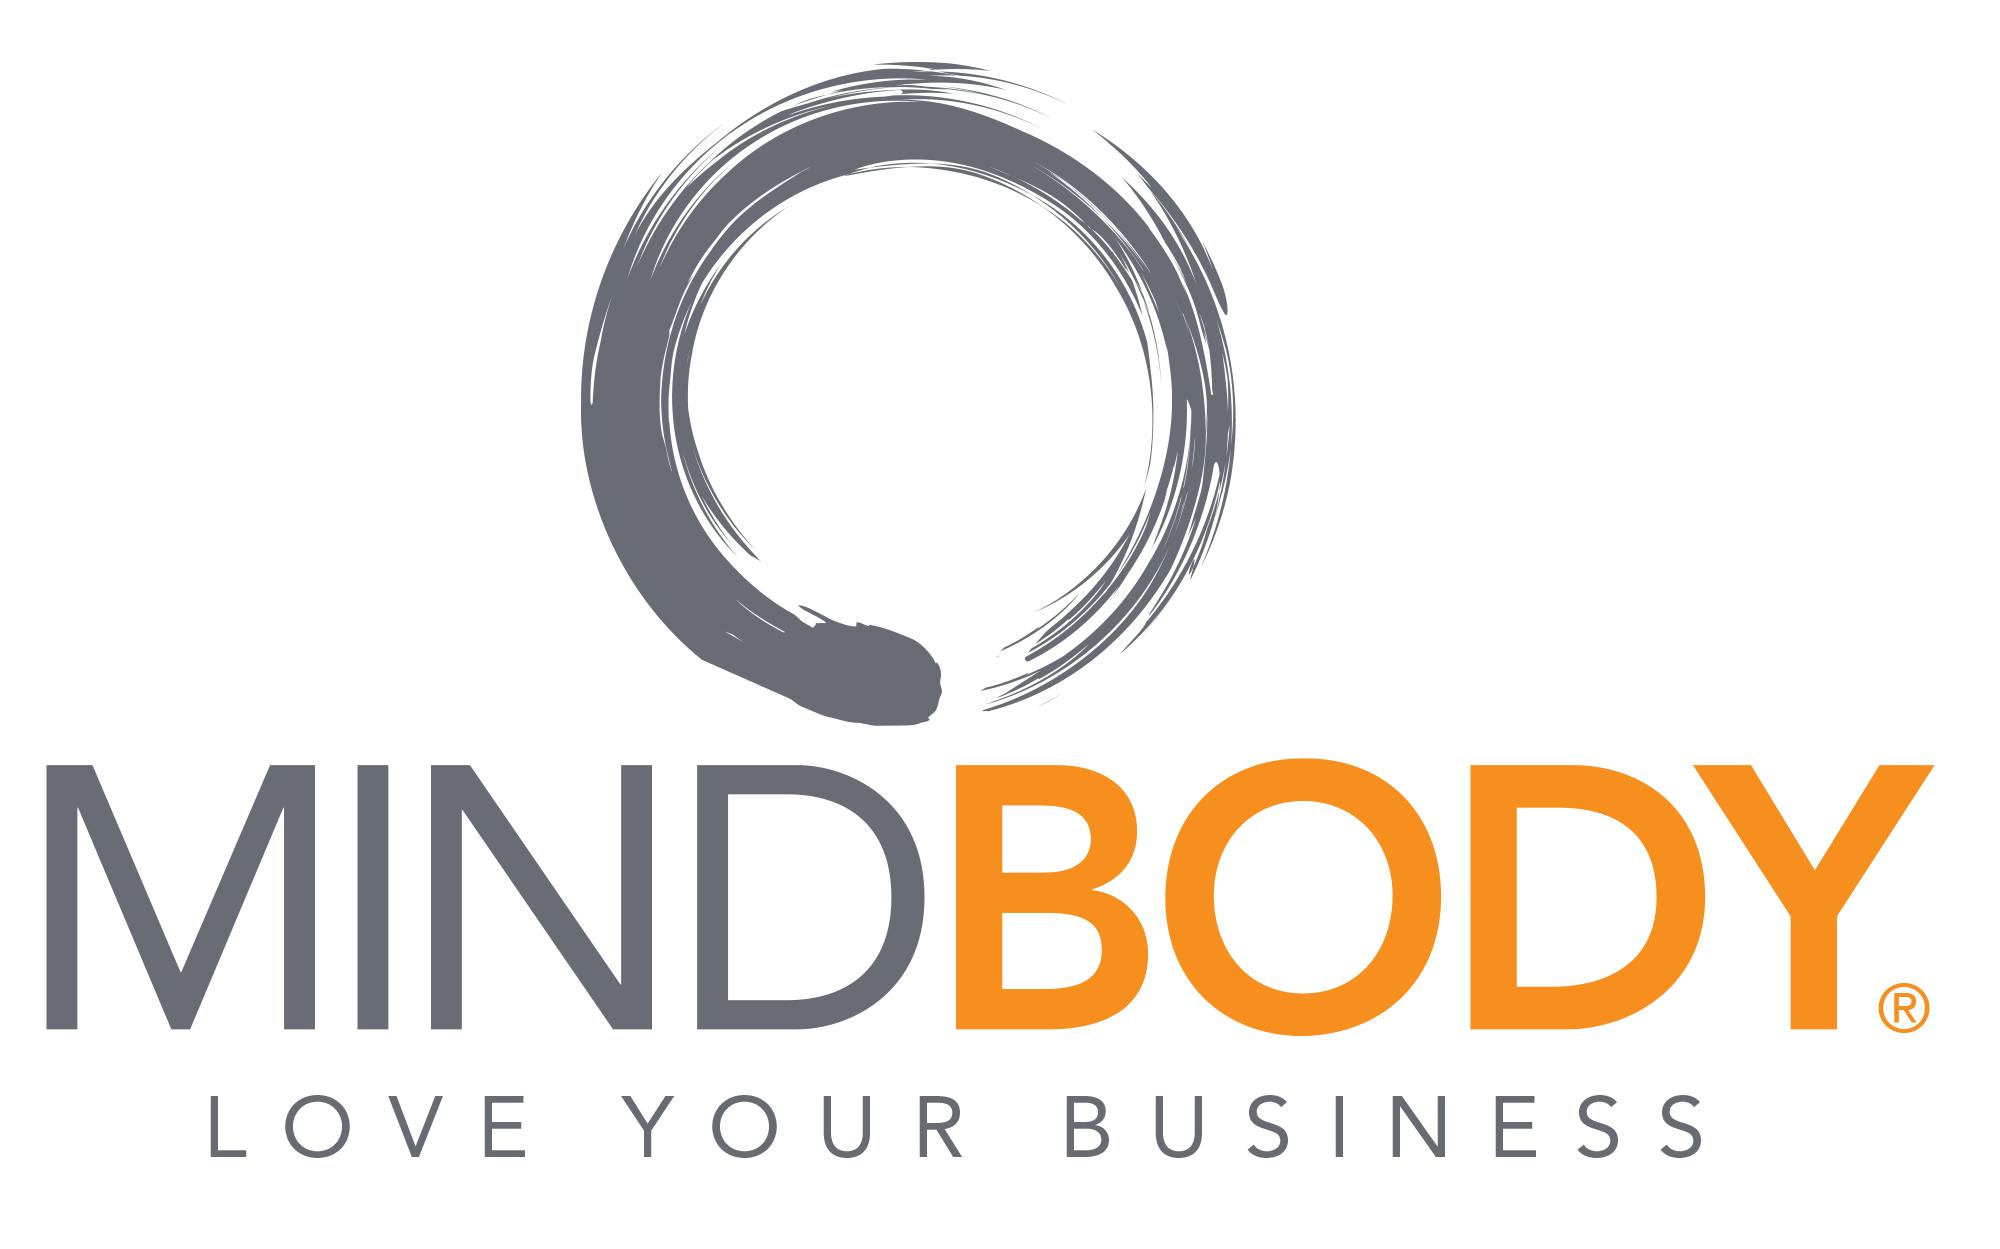 MINDBODY-company-logo.png